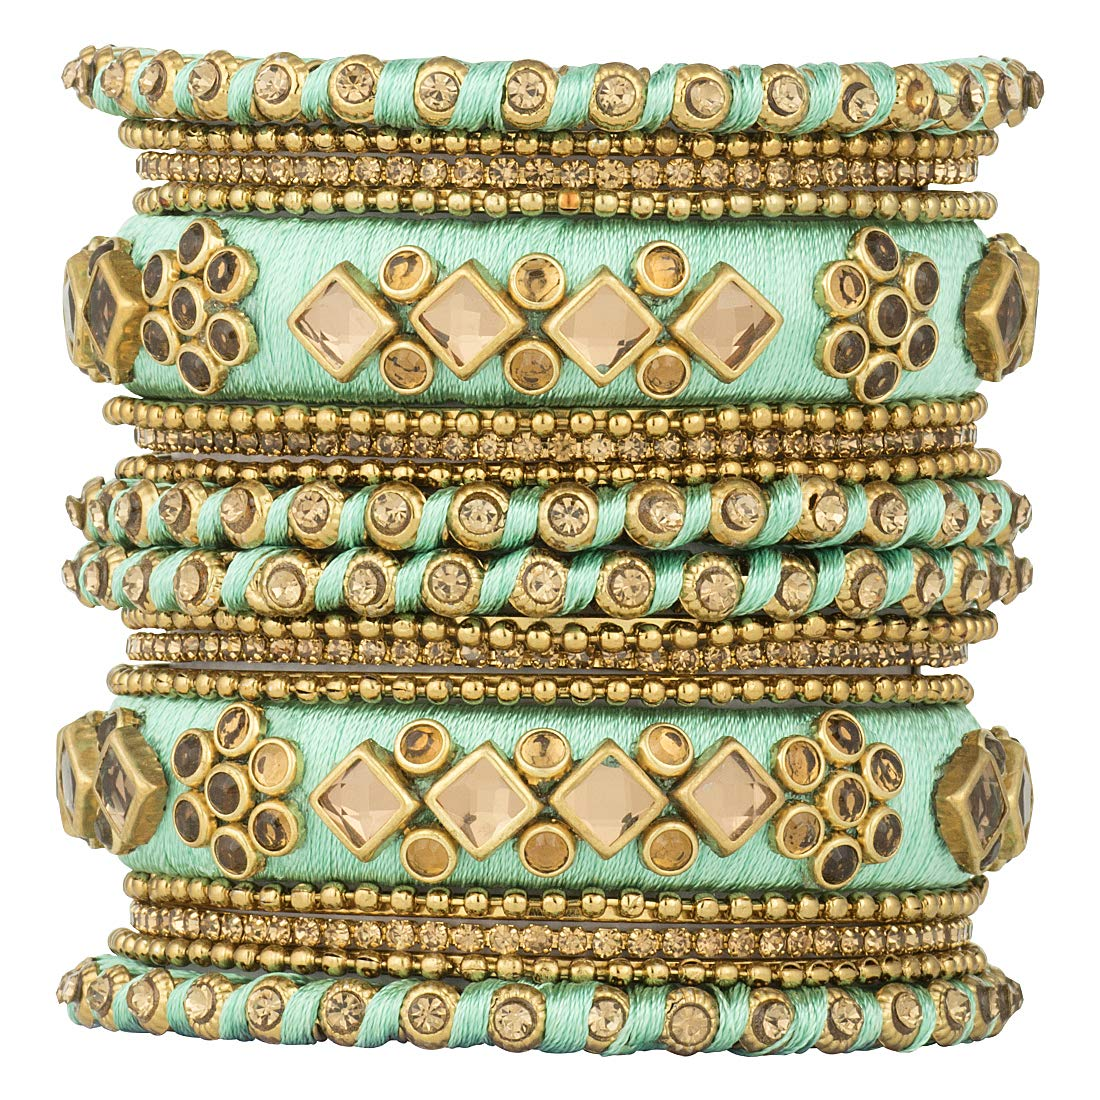 Peora Ethnic Beautiful Handmade Silk Thread Stone Studded Matching Bangle Chuda Set Fashion Jewellery for Women Girls, Size - 2.6 (B07QX8G4Q7) Amazon Price History, Amazon Price Tracker